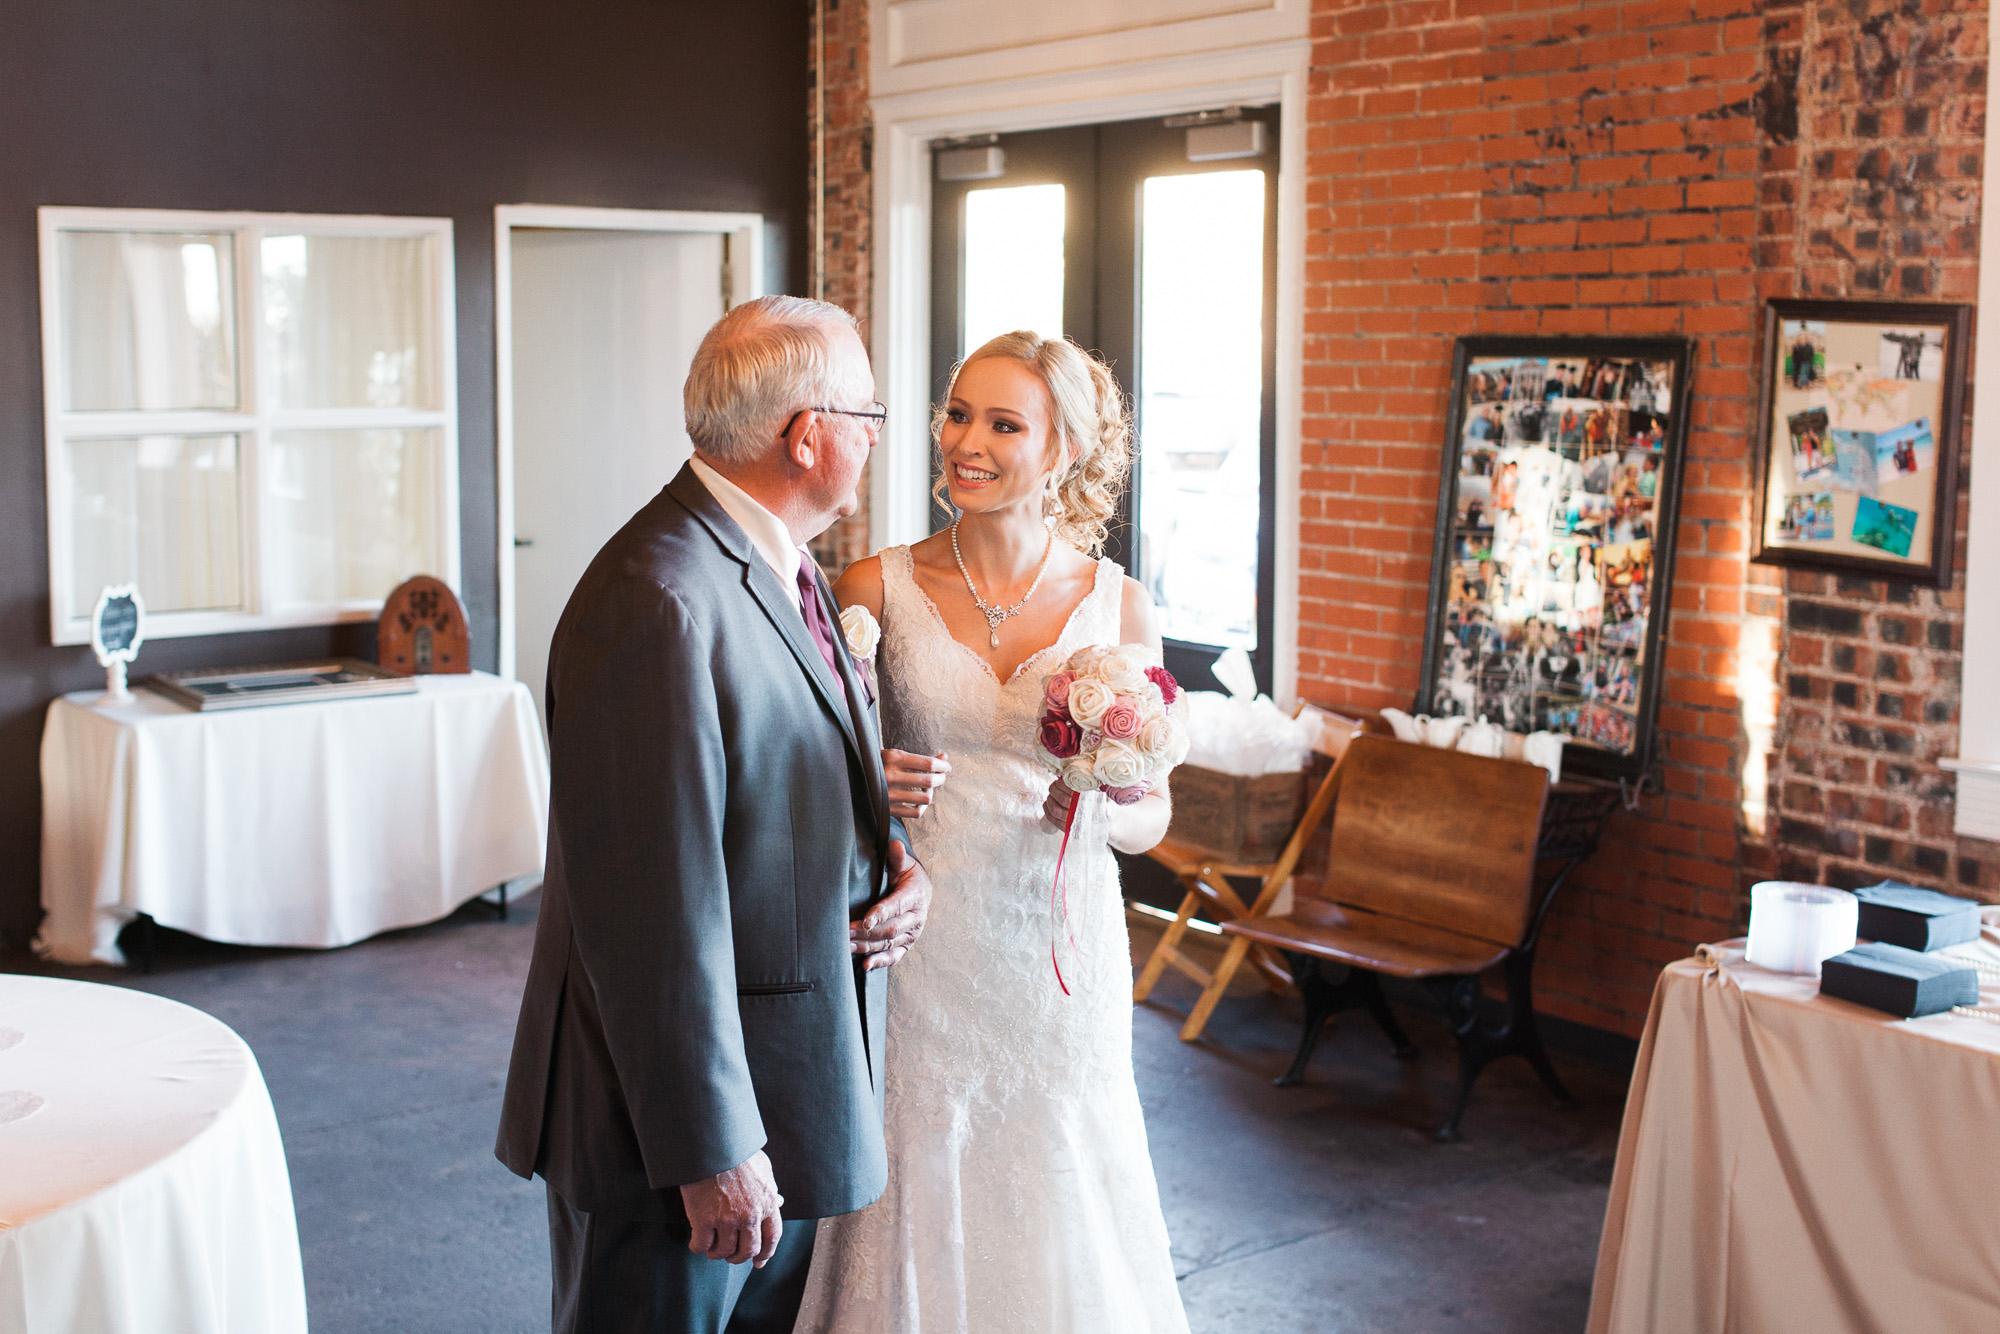 cbc18-downtown-bryan-weddingdowntown-bryan-wedding.jpg